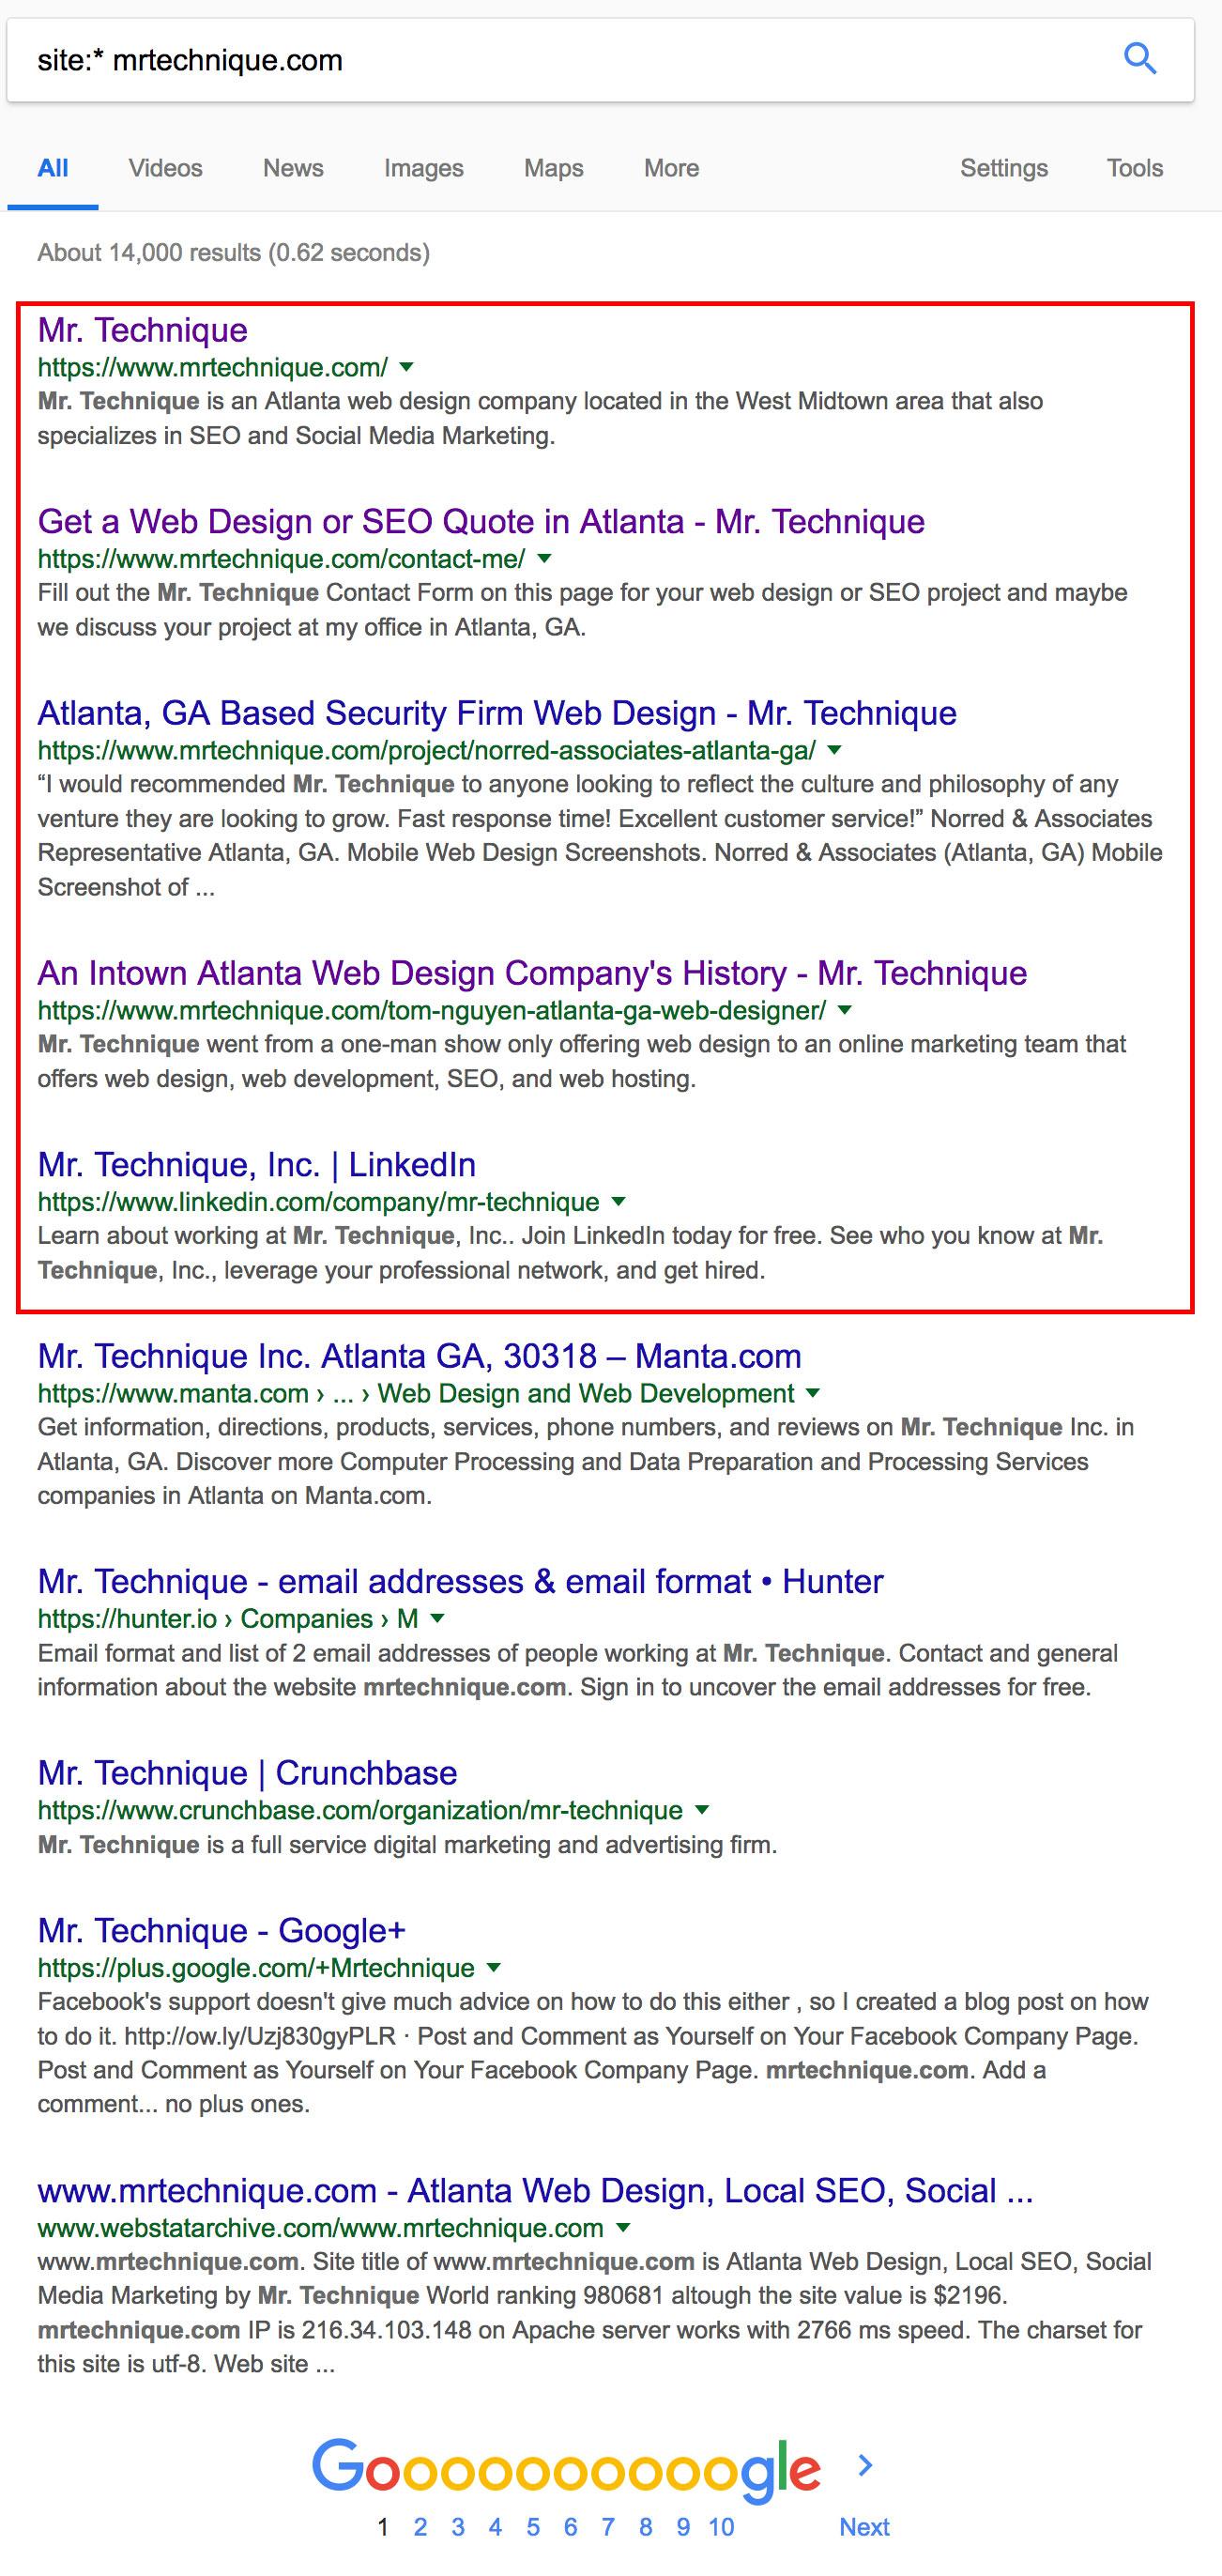 Site Asterisk (*) Search Query for mrtechnique.com